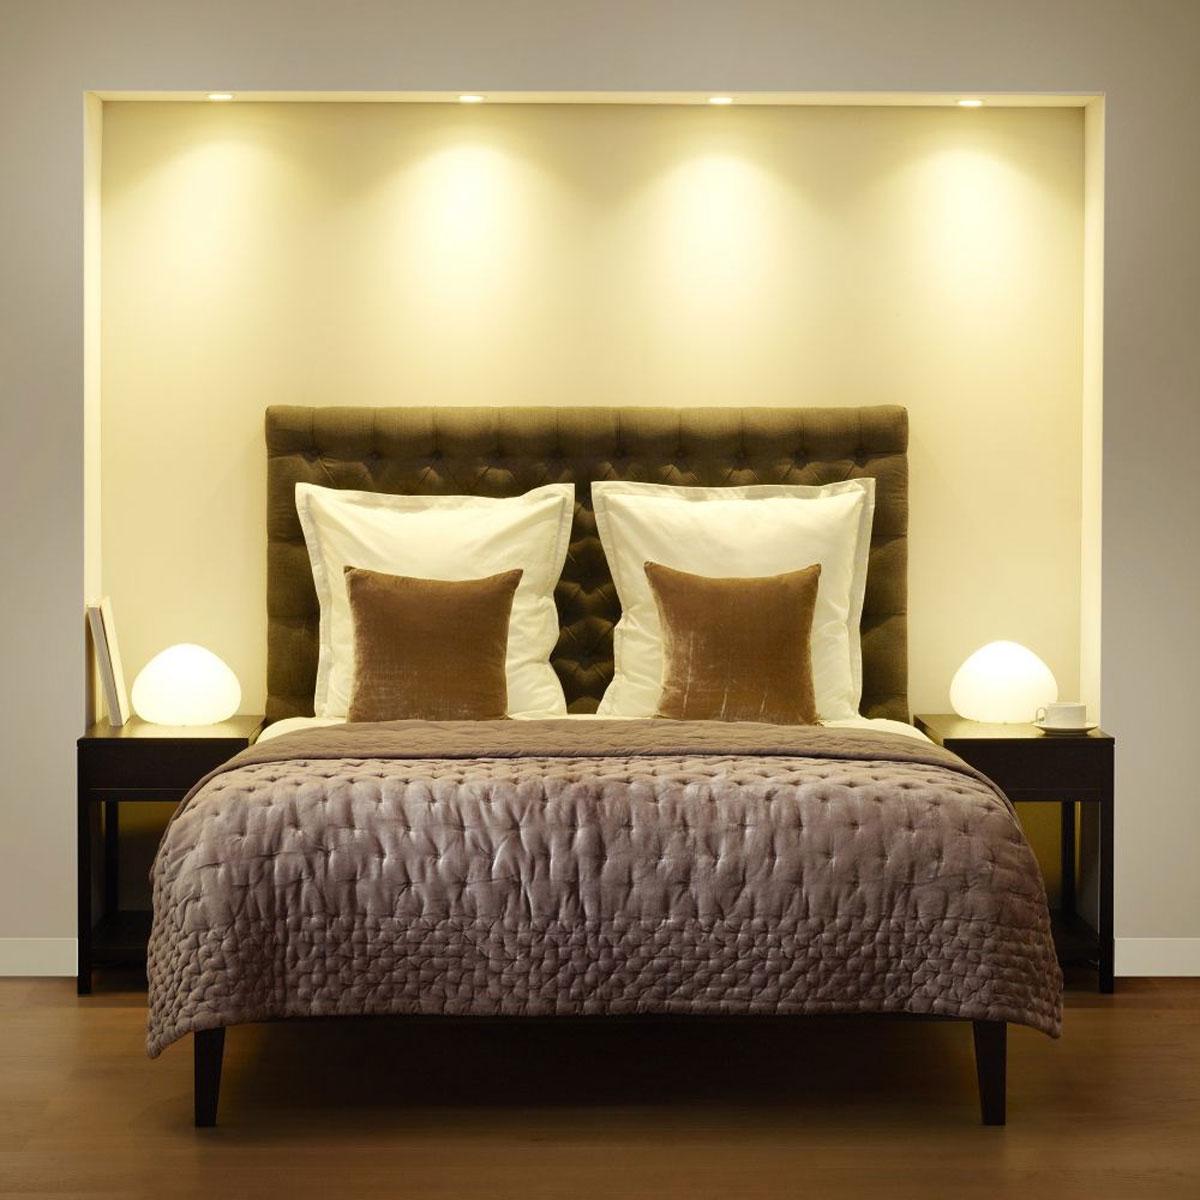 philips hue lamp starterset 3 lampen met bridge. Black Bedroom Furniture Sets. Home Design Ideas